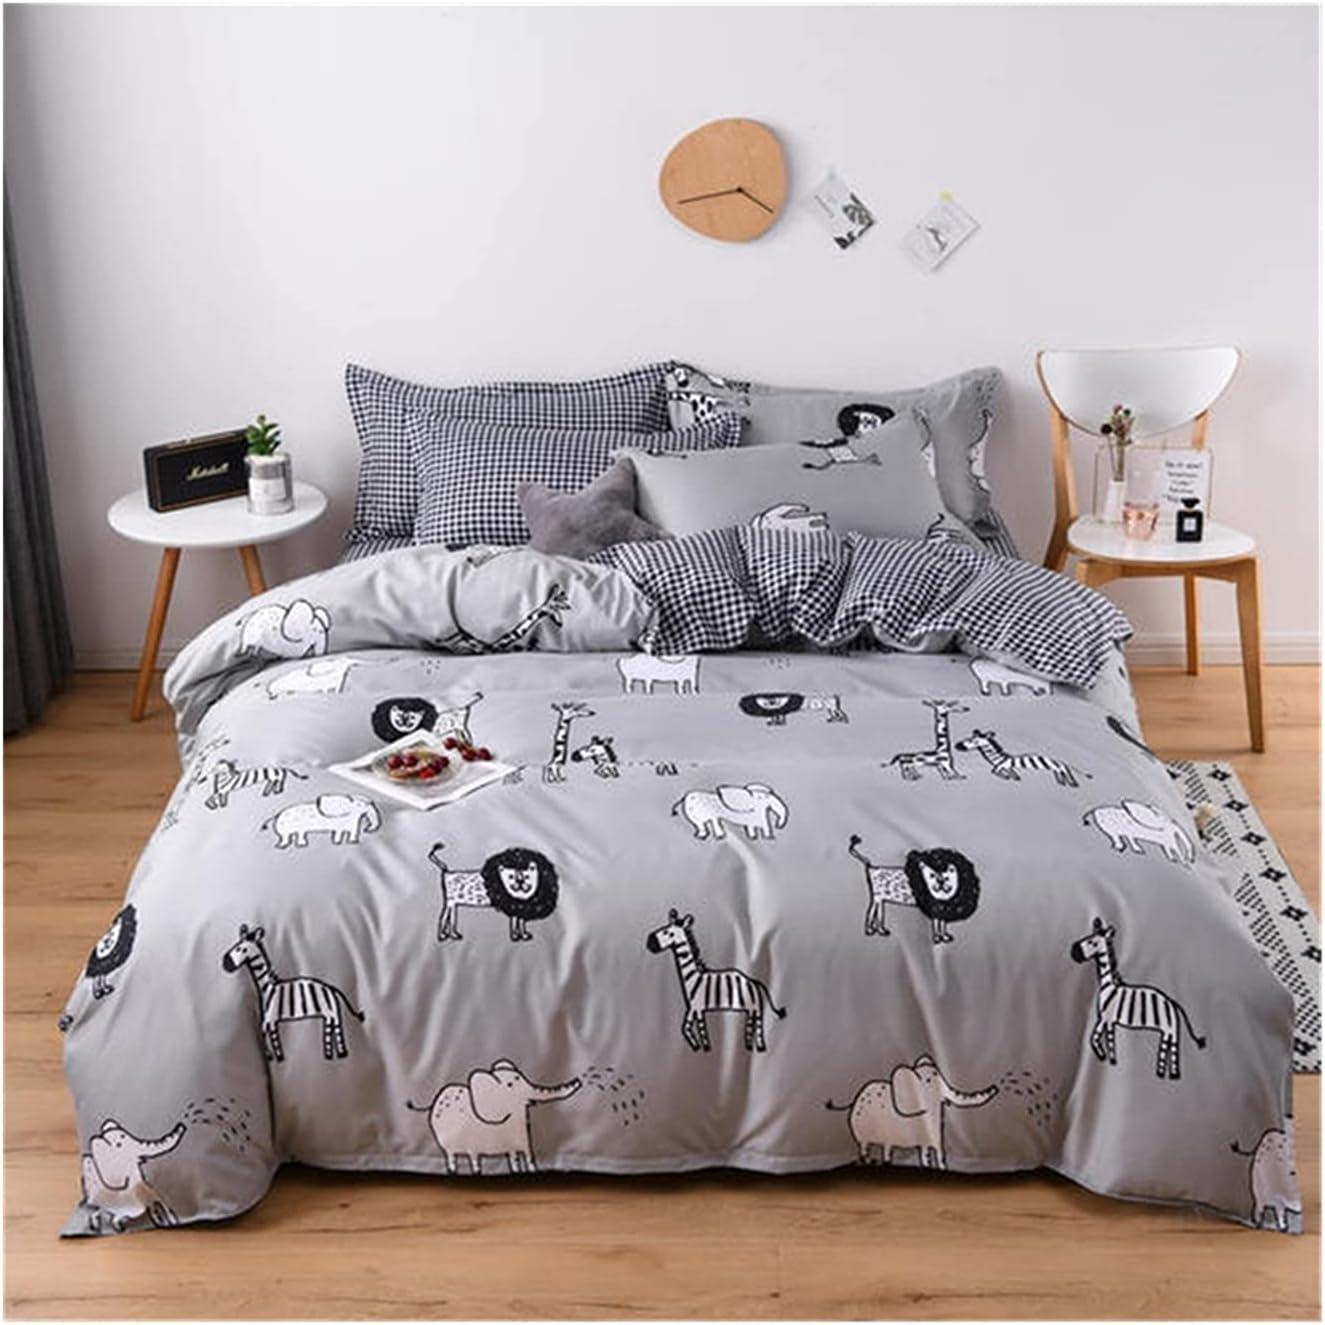 LSDJ Ranking TOP2 QMDSH Home Textile Girl Max 60% OFF Bedding Set Duvet Peach Cover Pink